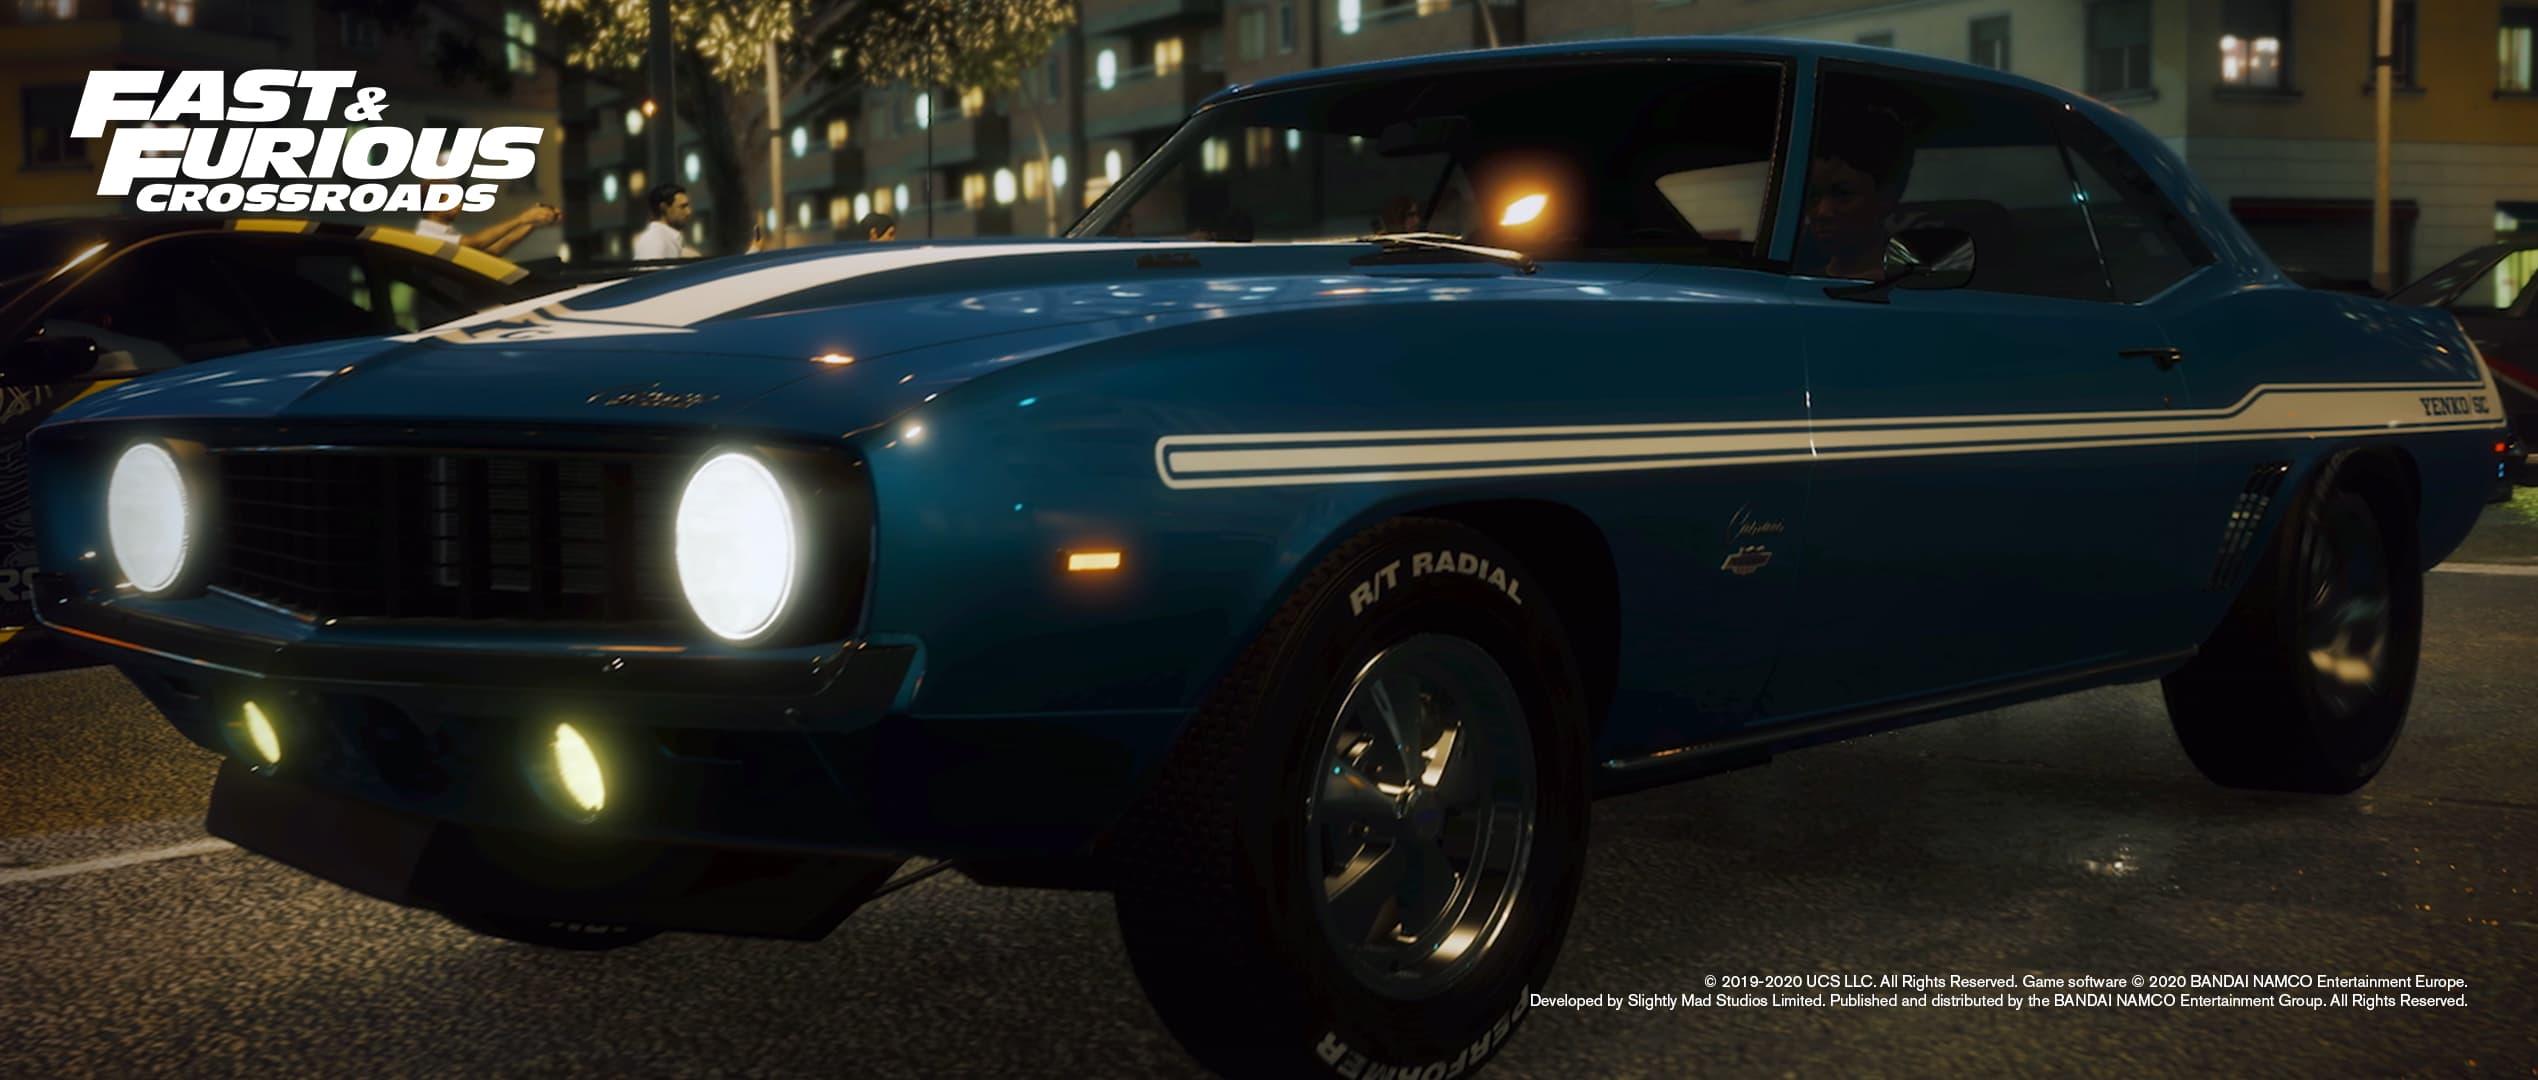 Fast & Furious: Crossroads Xbox One